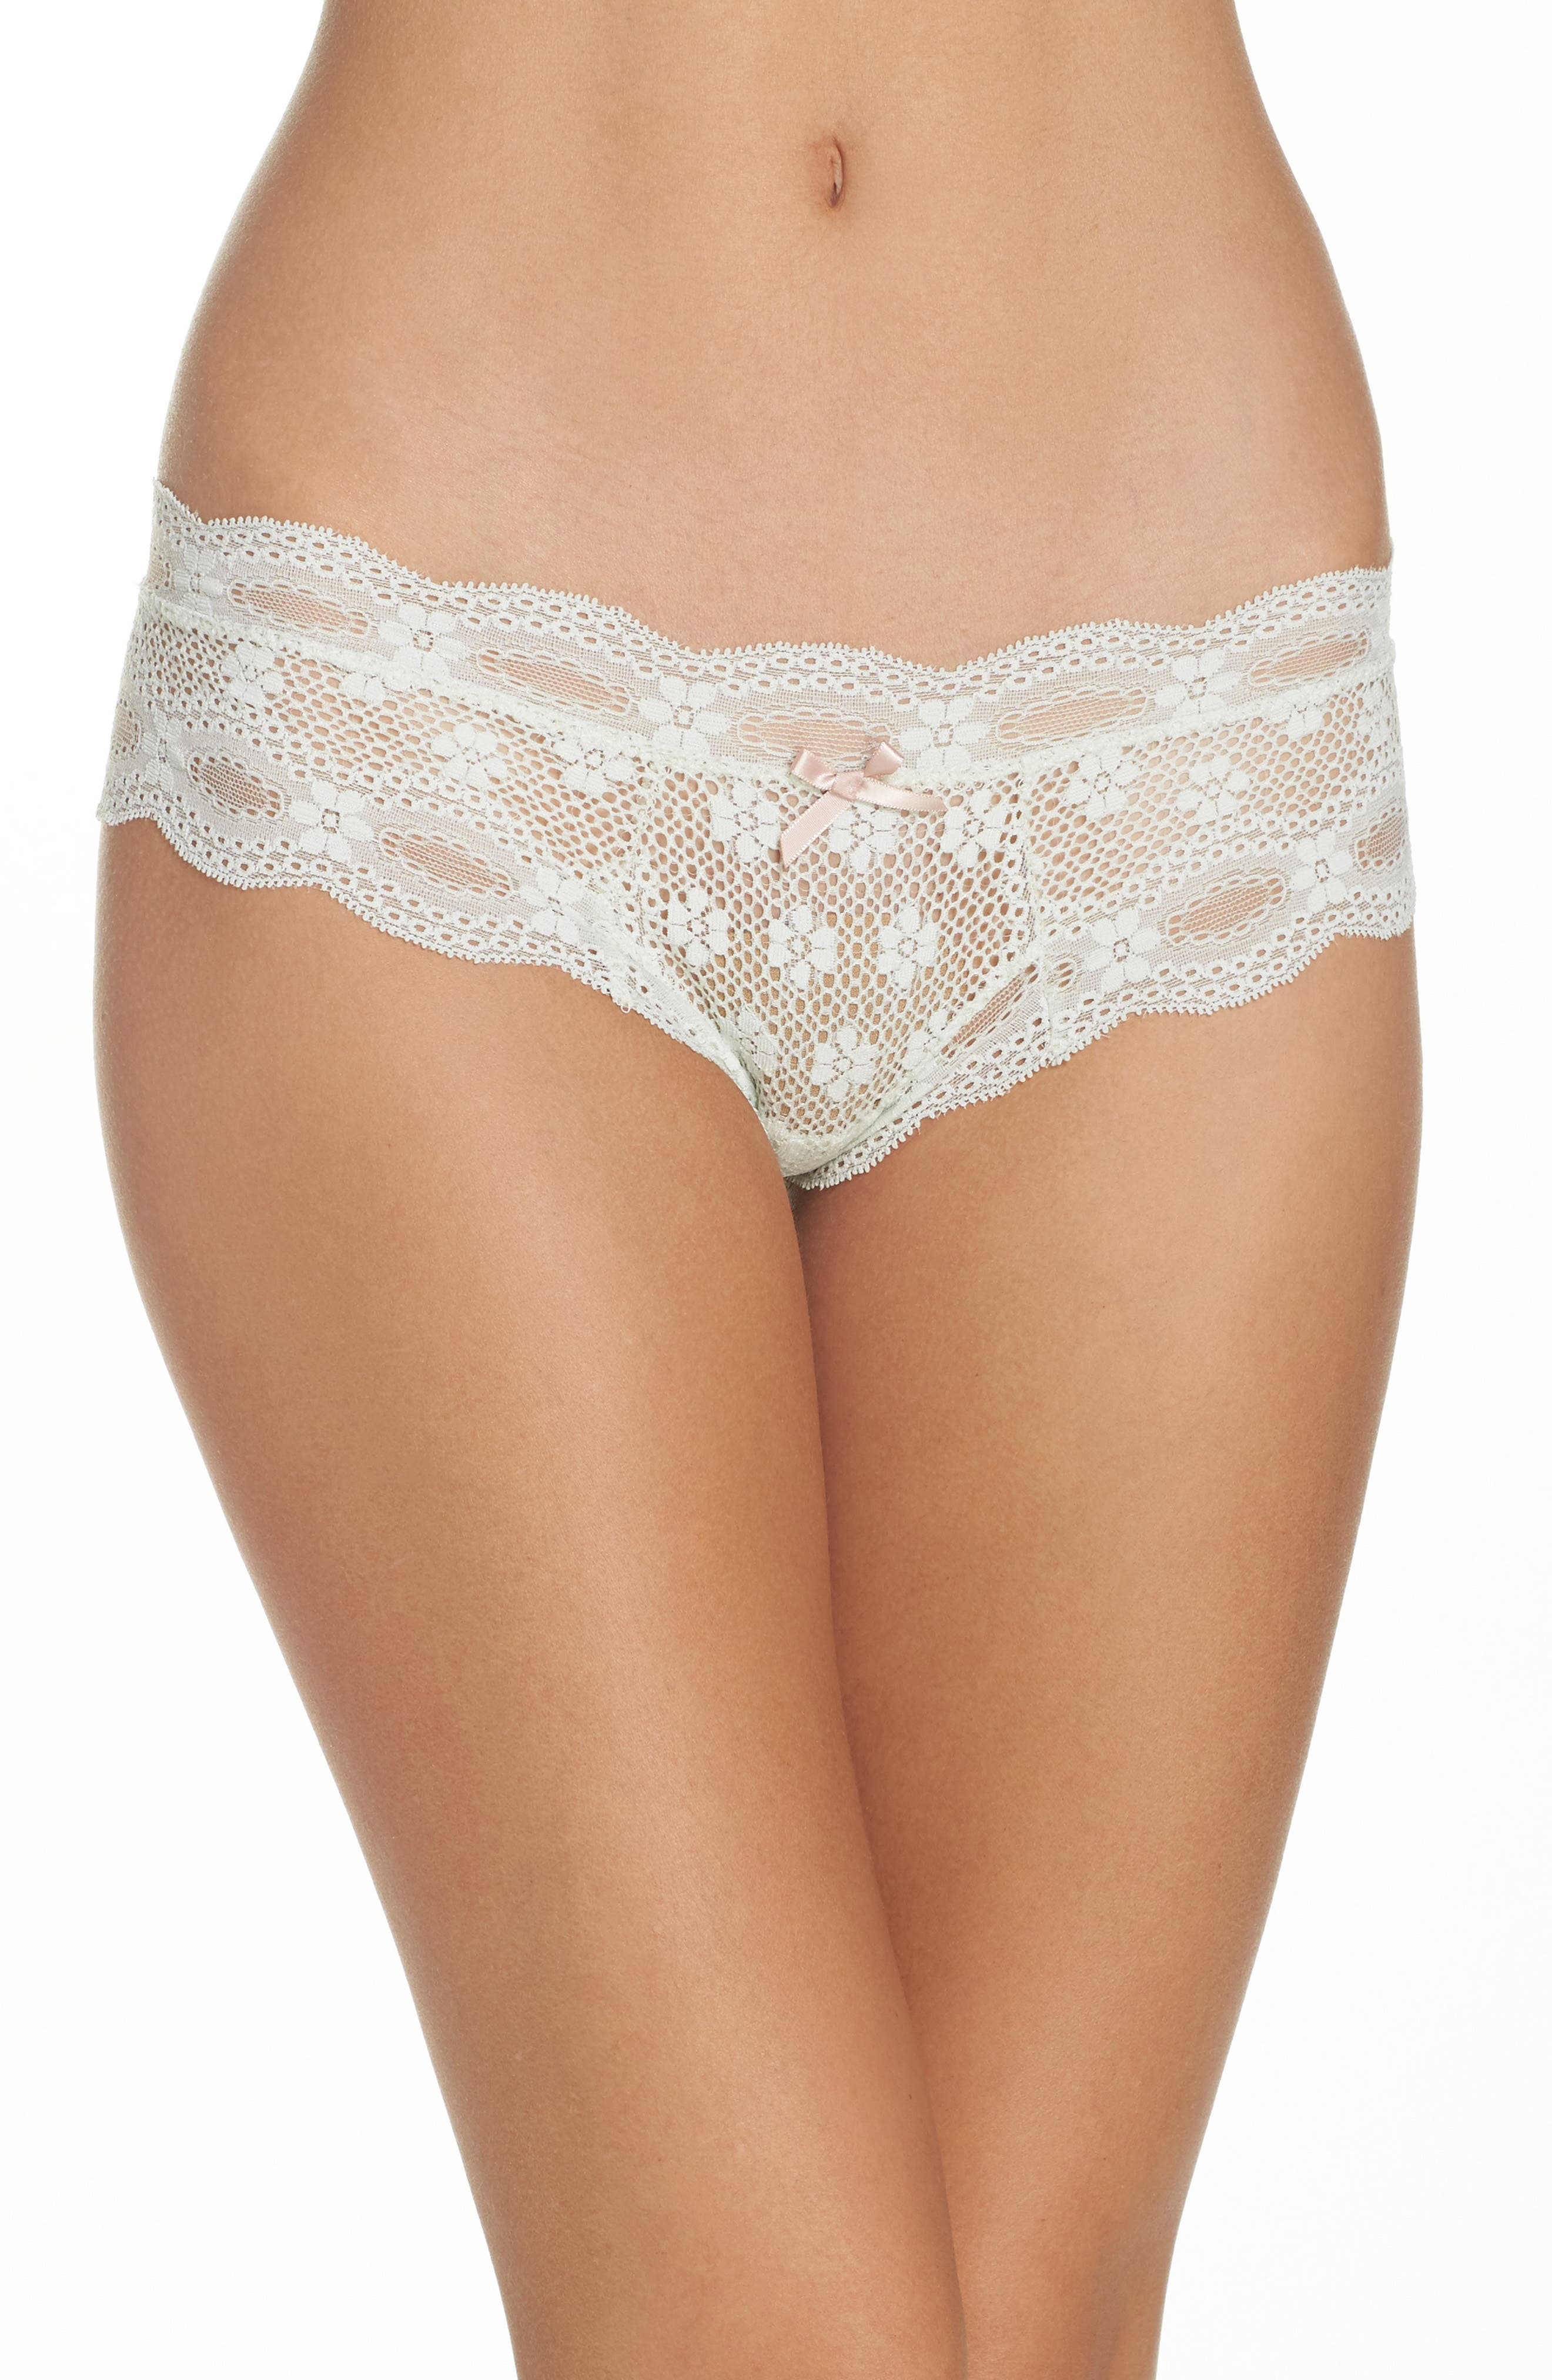 Eberjey 'India' Lace Thong